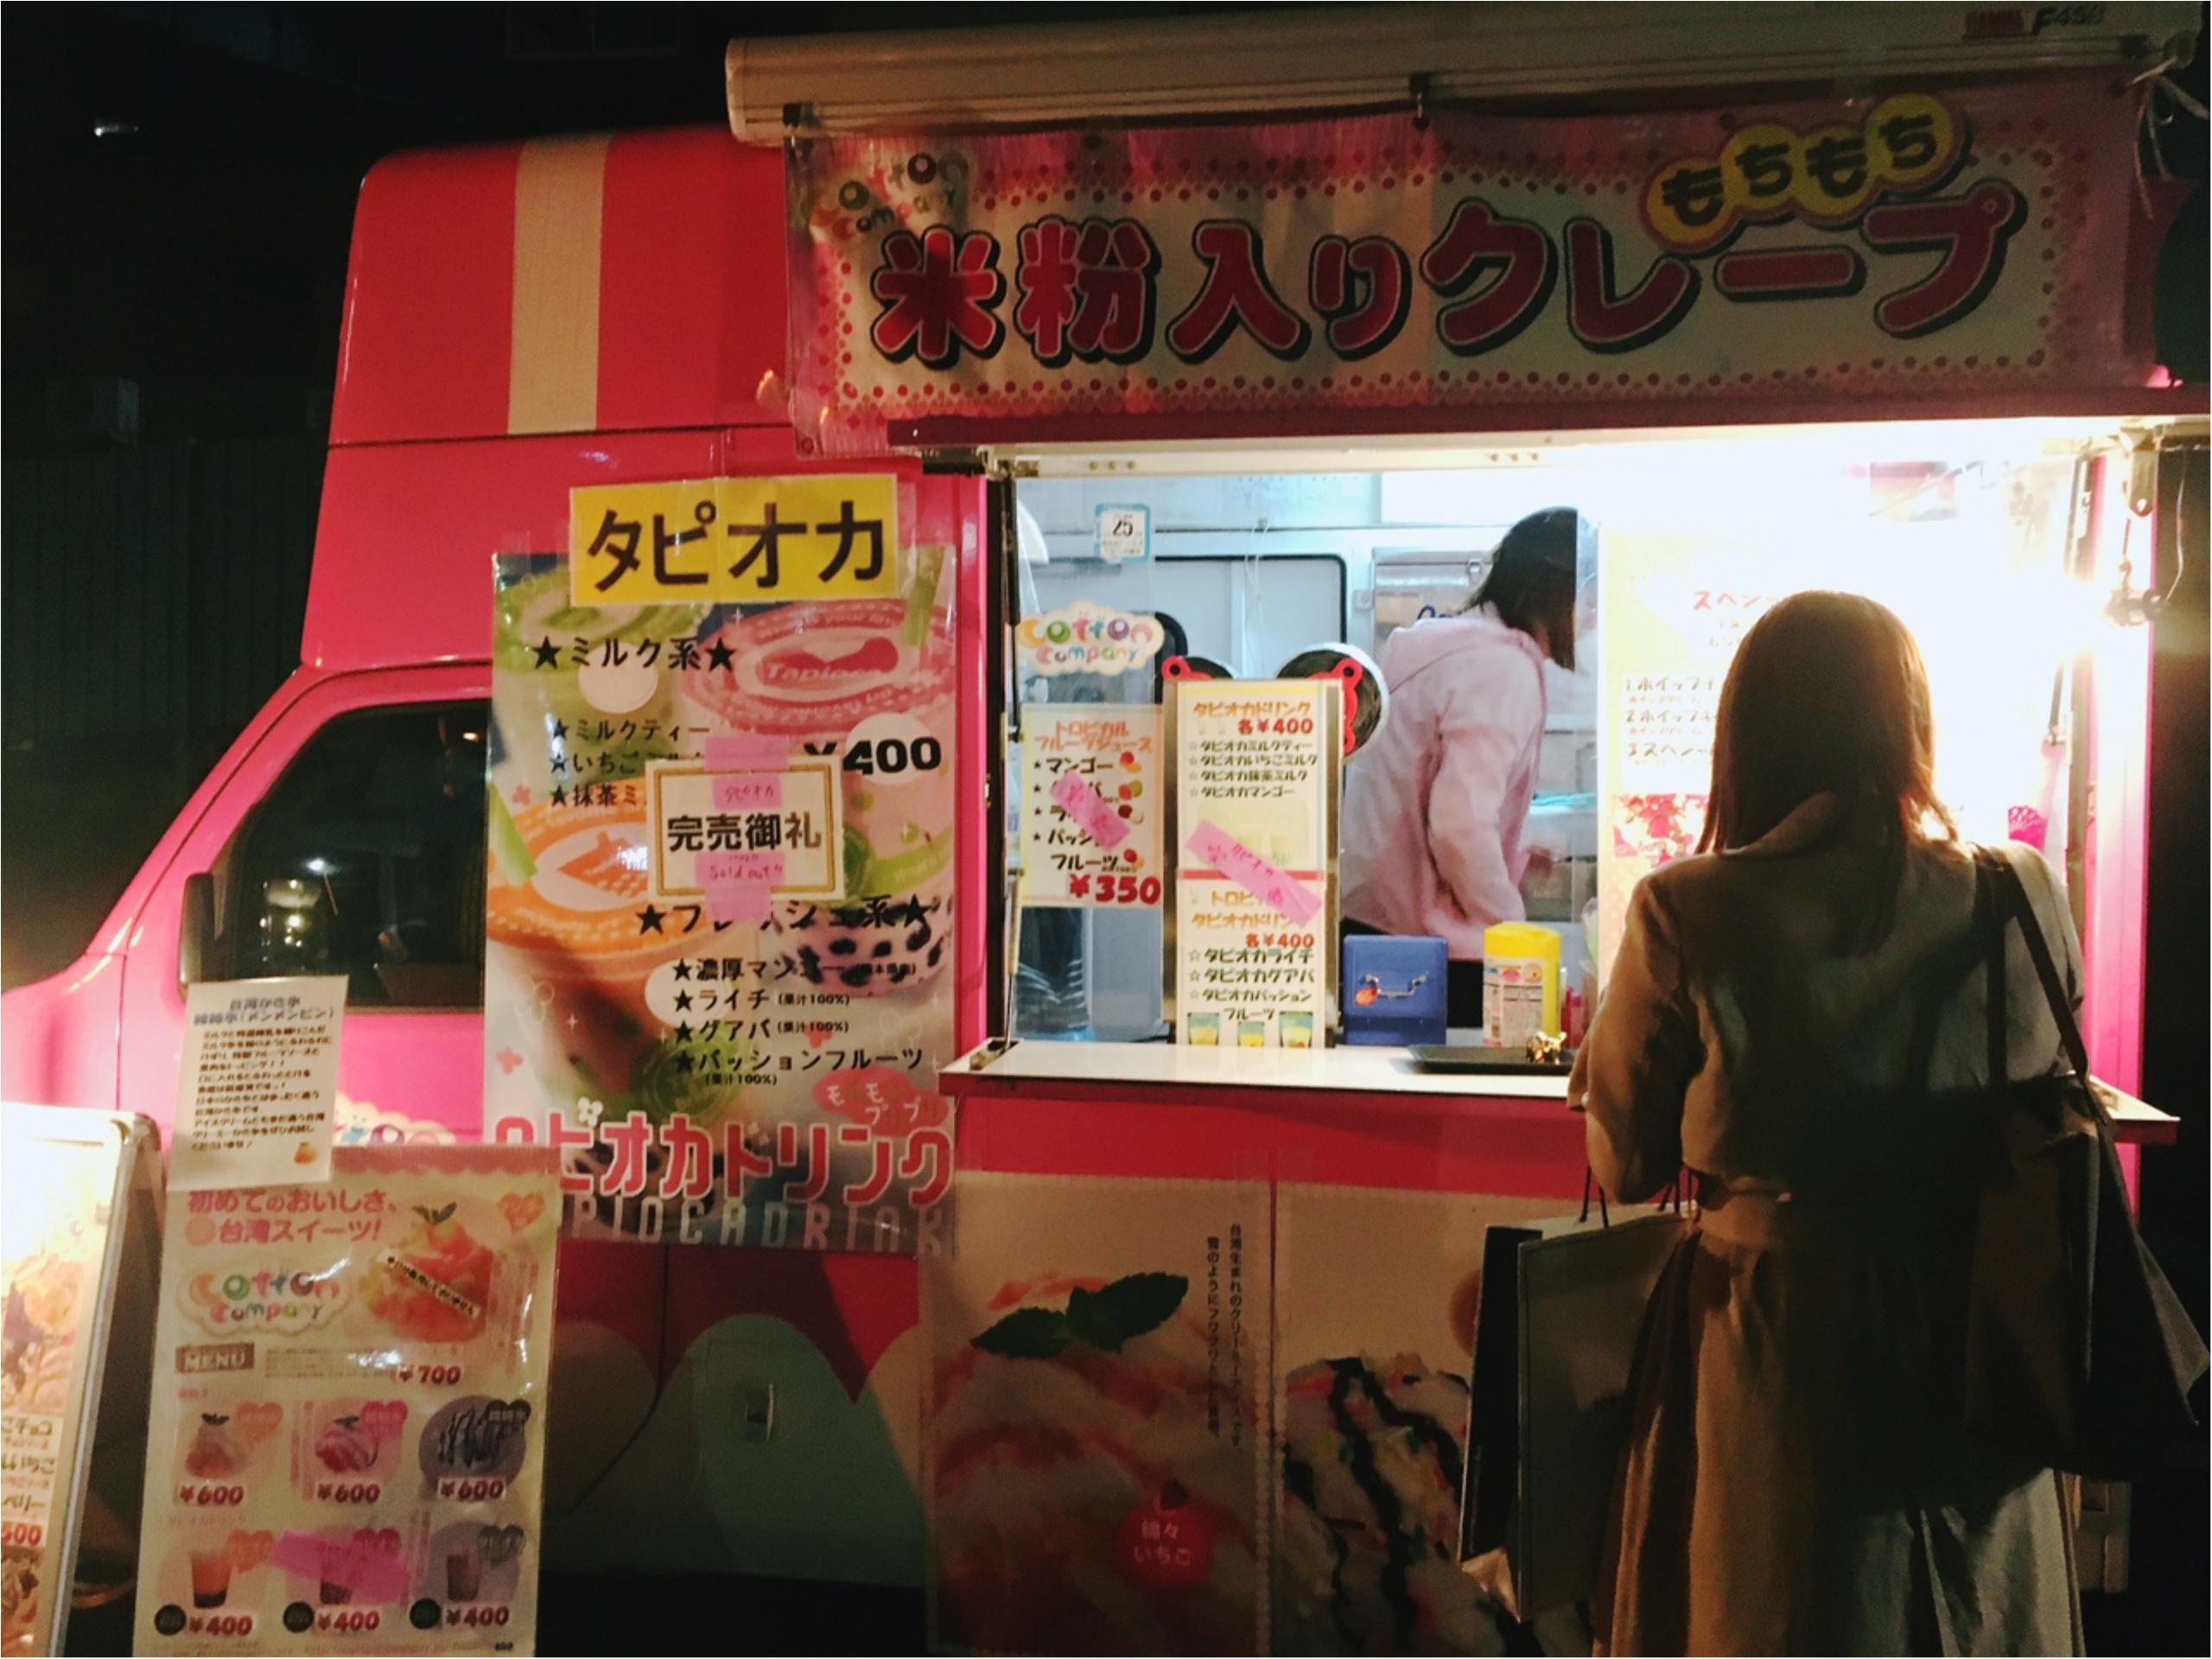 【TOKYO OUTLET WEEK】週末はファッションアウトレットイベントへ!お買い得すぎる戦利品公開♡_5